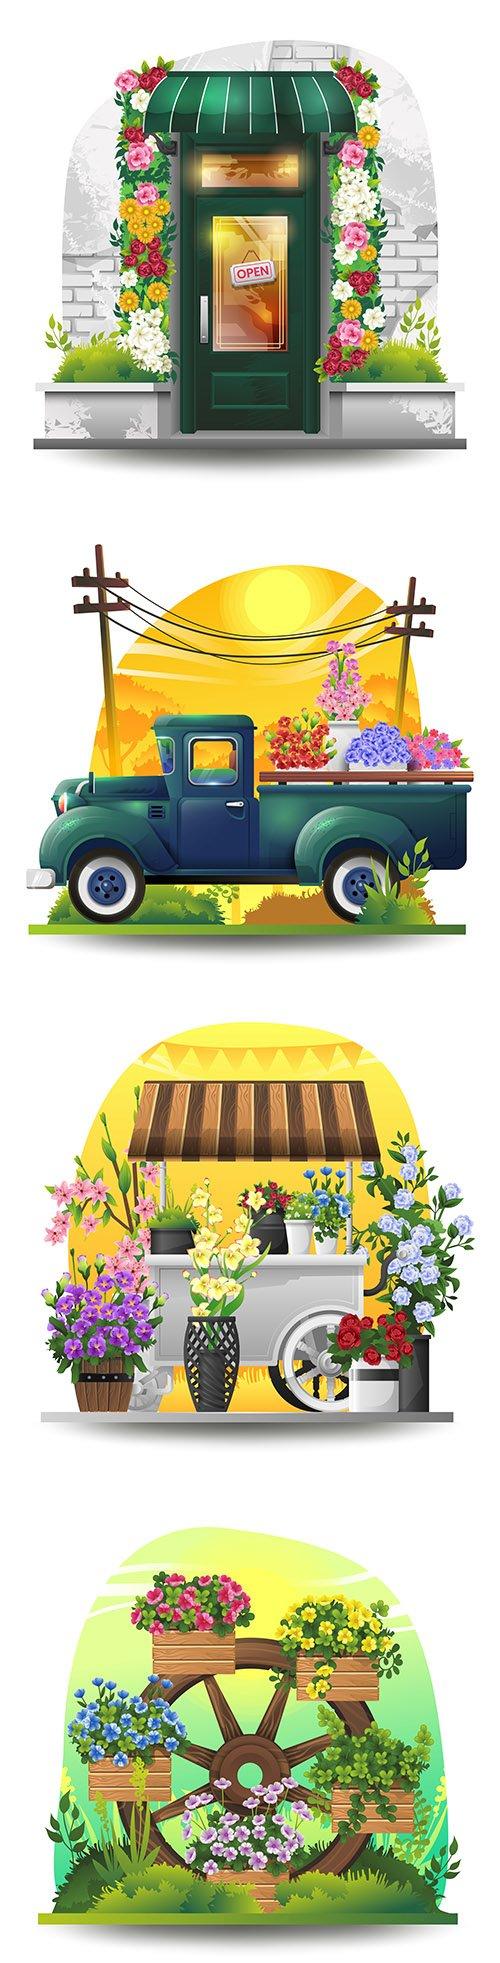 Flower cart with flowers in spring garden illustration